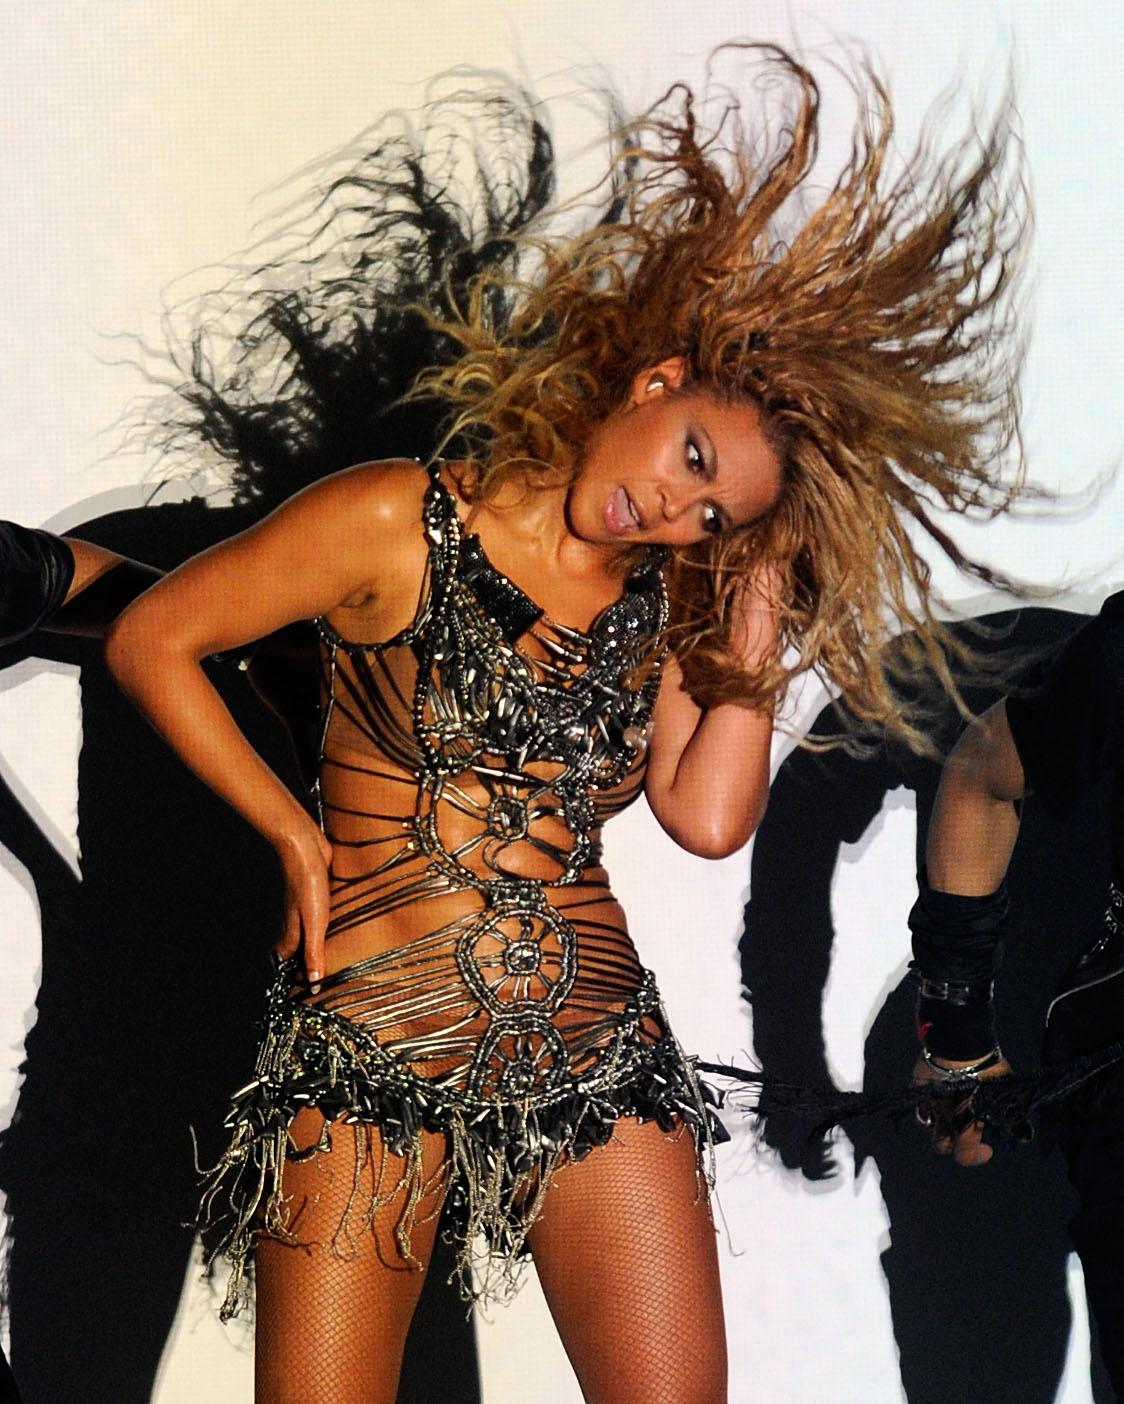 http://2.bp.blogspot.com/-0KBygJTxlfc/UE7xSIk0pHI/AAAAAAAABII/twUaont3Bwo/s1600/Beyonce-12.jpg